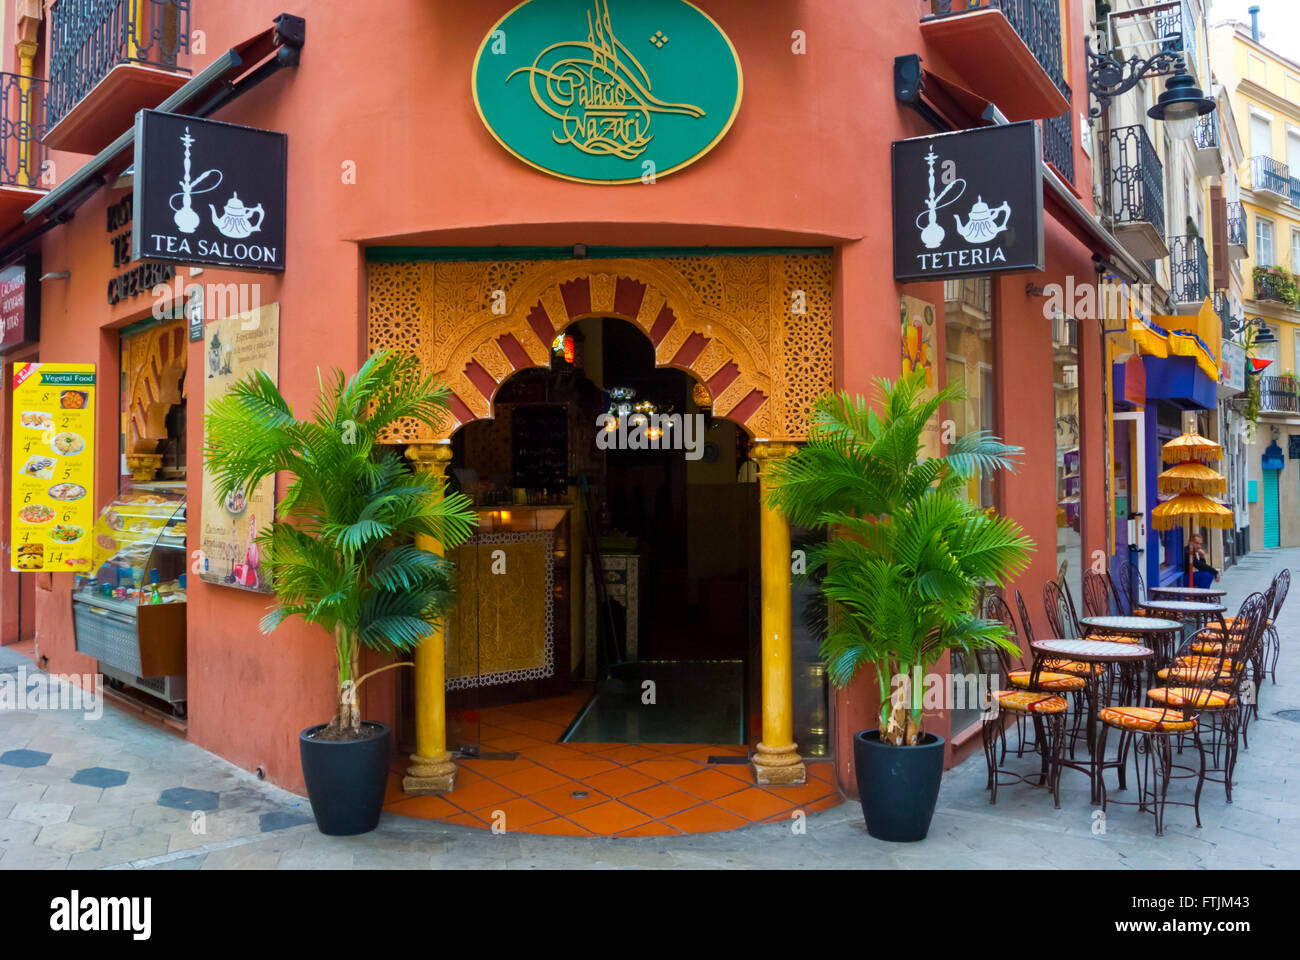 Teteria, tea saloon, old town, Malaga, Andalucia, Spain Stock Photo